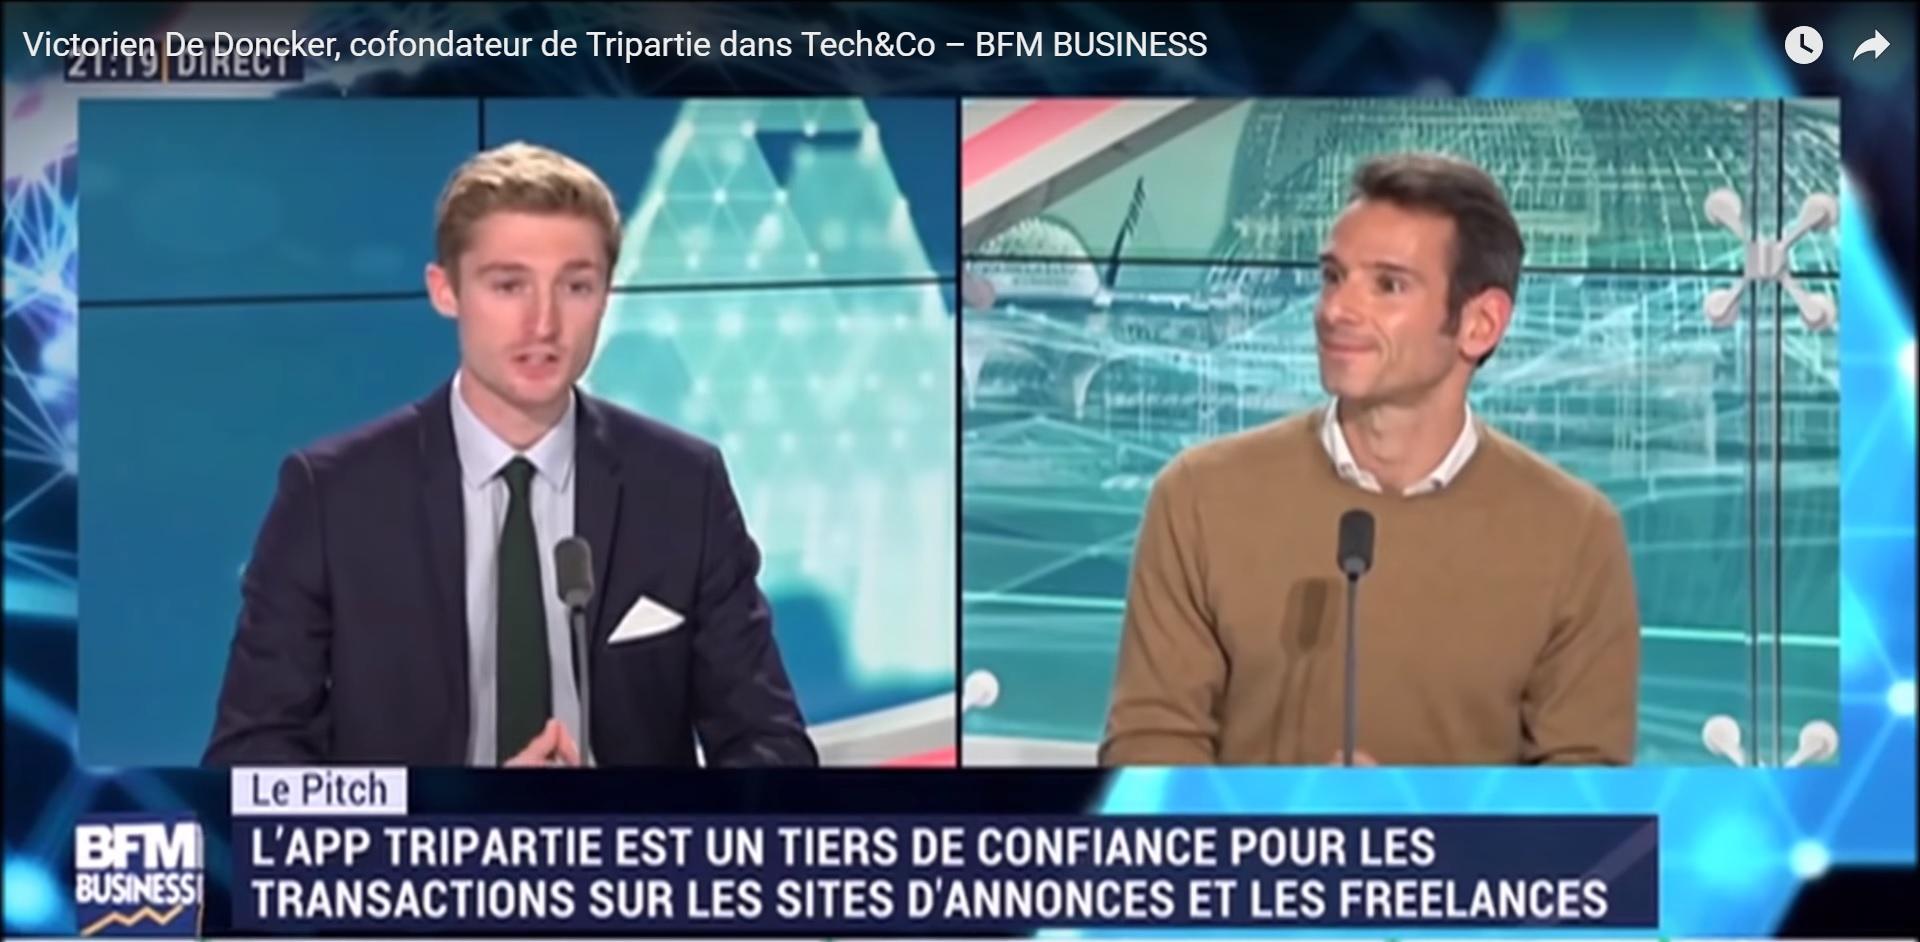 Tripartie cofounder Victorien presents his pitch on Tech & Co TV show